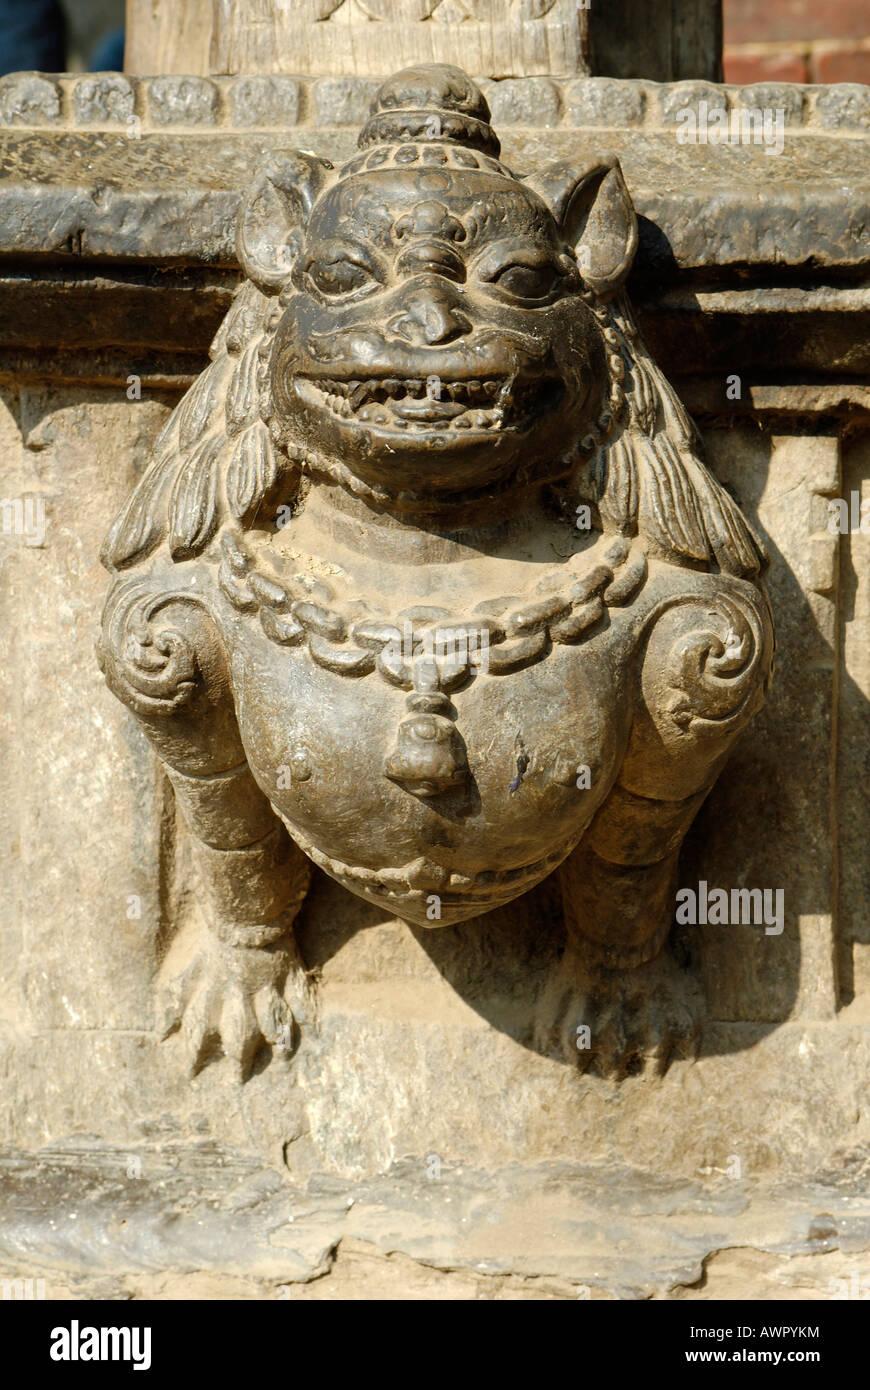 Hinduistische Steinskulptur, Durbar Square von Patan, Lalitpur, Kathmandu, Nepal Stockbild